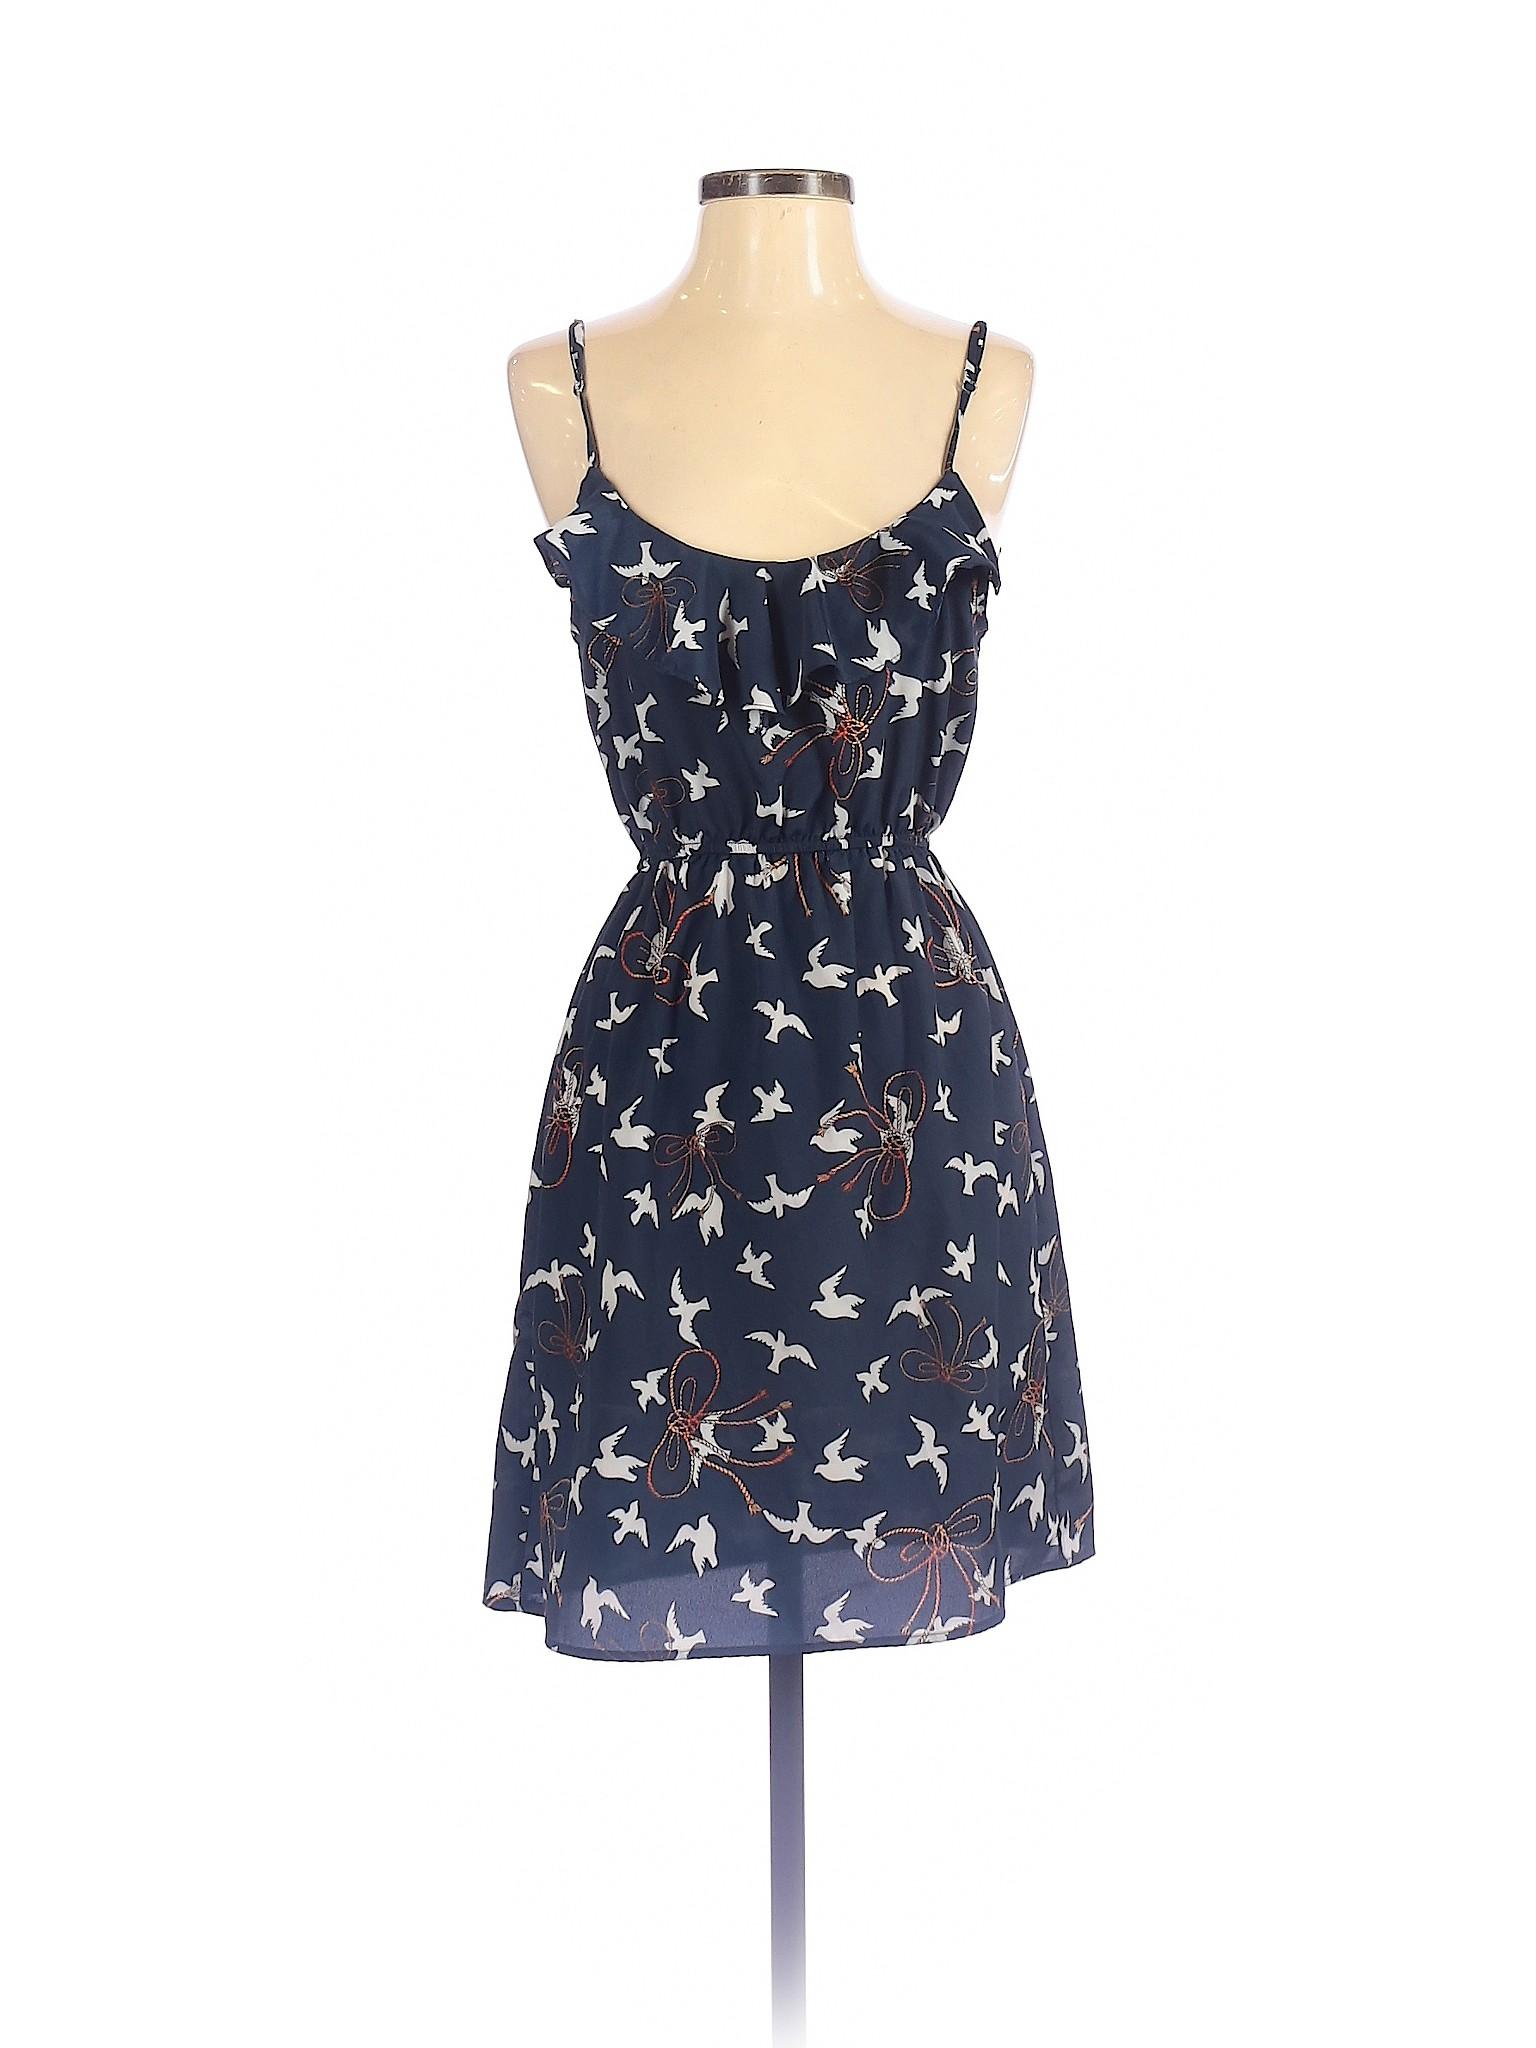 Gb Gianni Bini Women Blue Casual Dress S Ebay